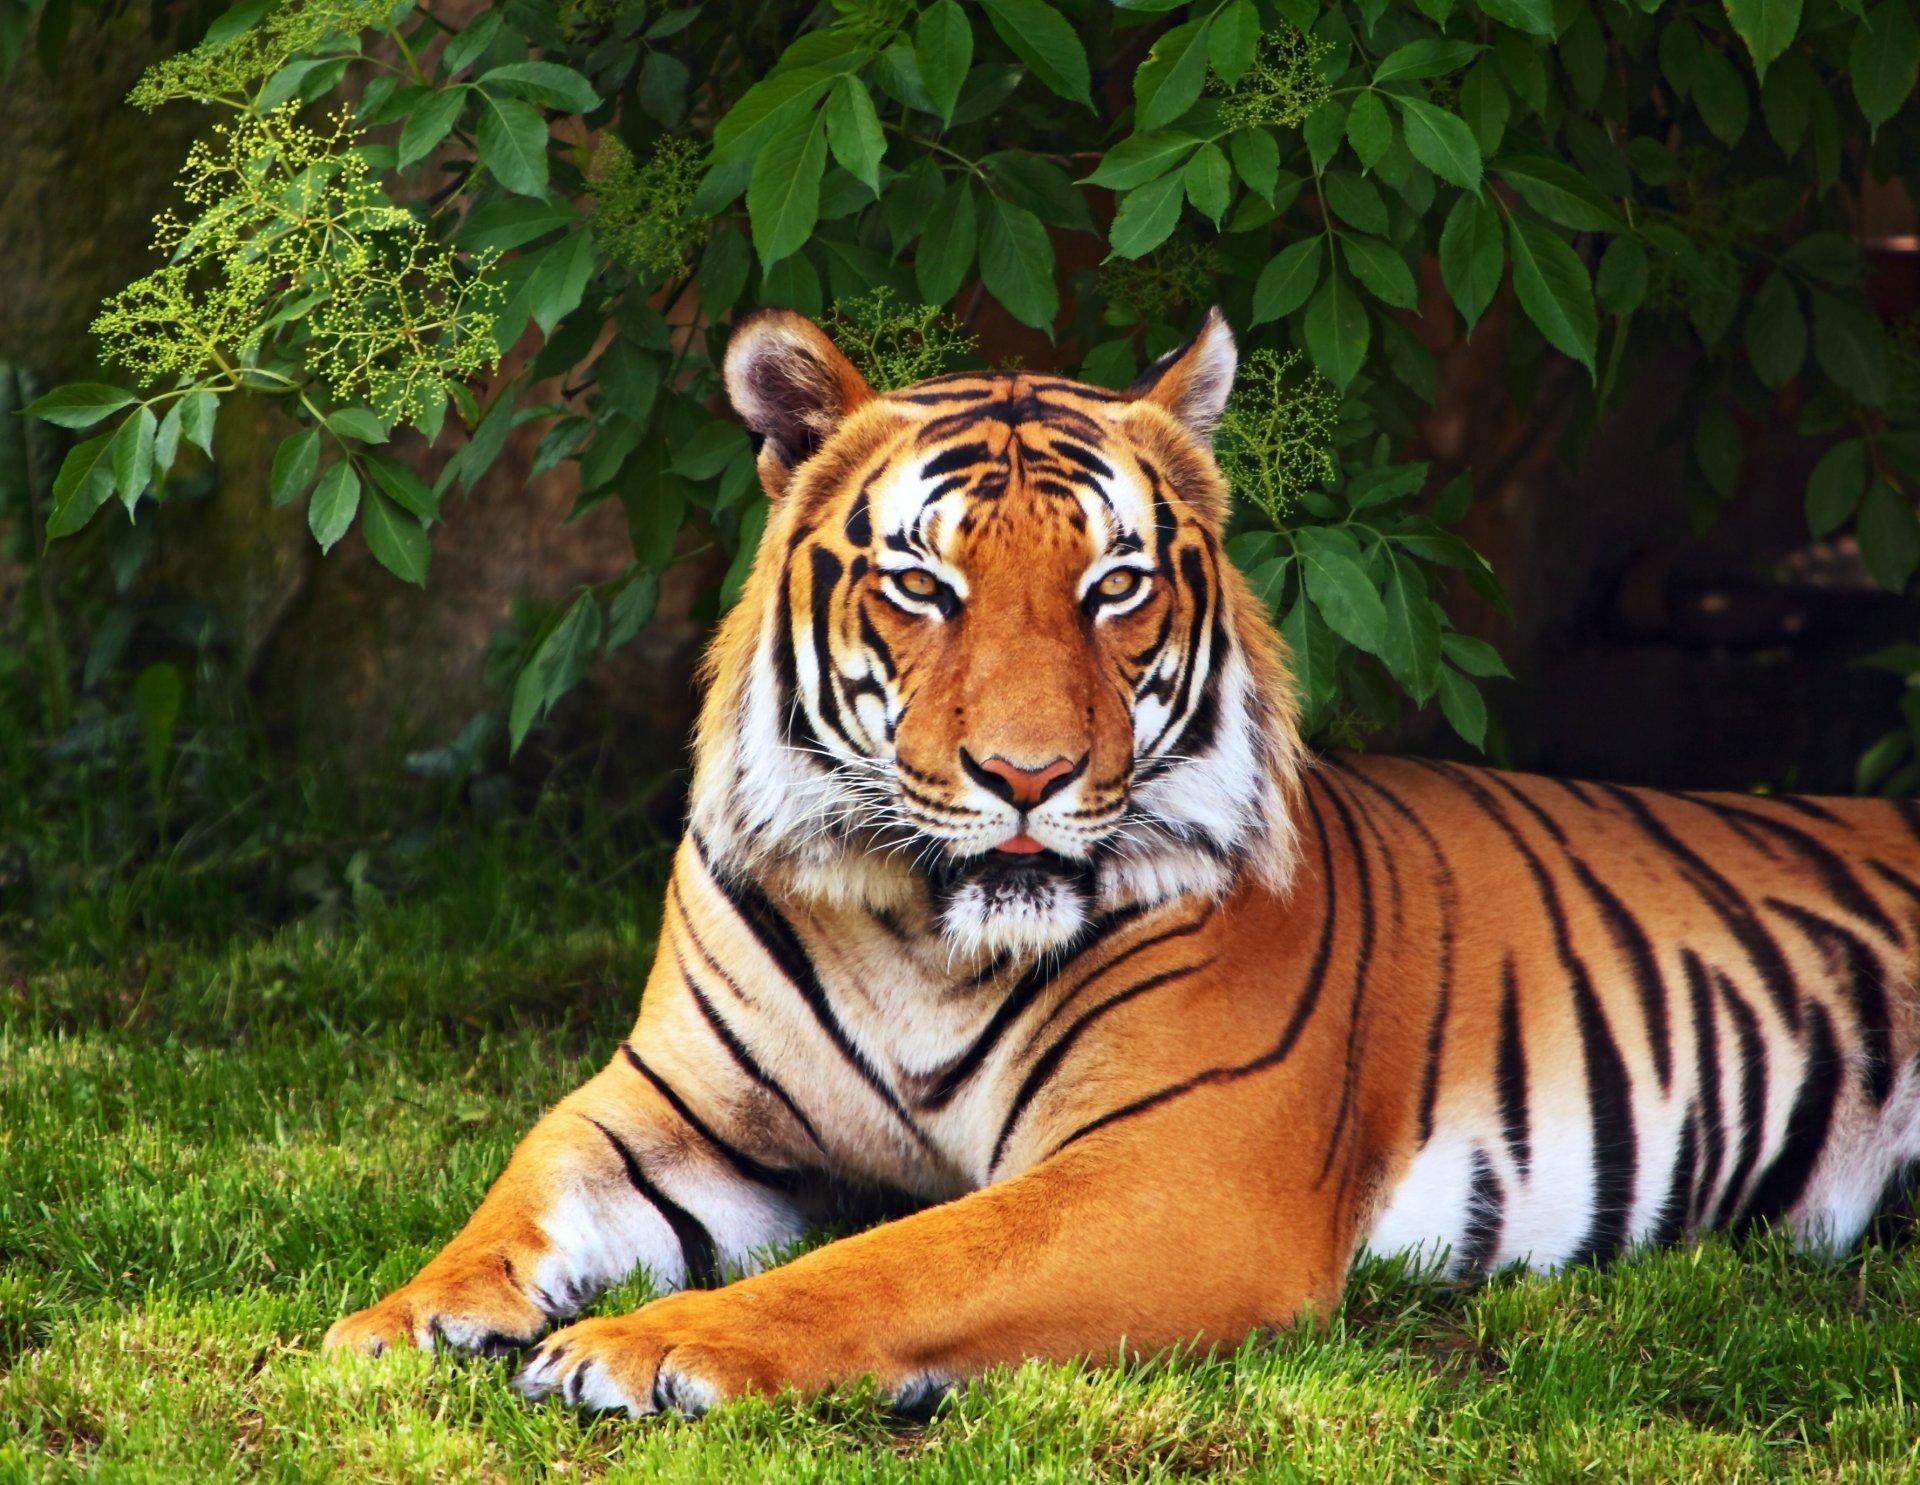 Animals Tiger Tree Leaves Grass Green Wallpaper Widescreen - Beautiful Animal Wallpapers Hd , HD Wallpaper & Backgrounds